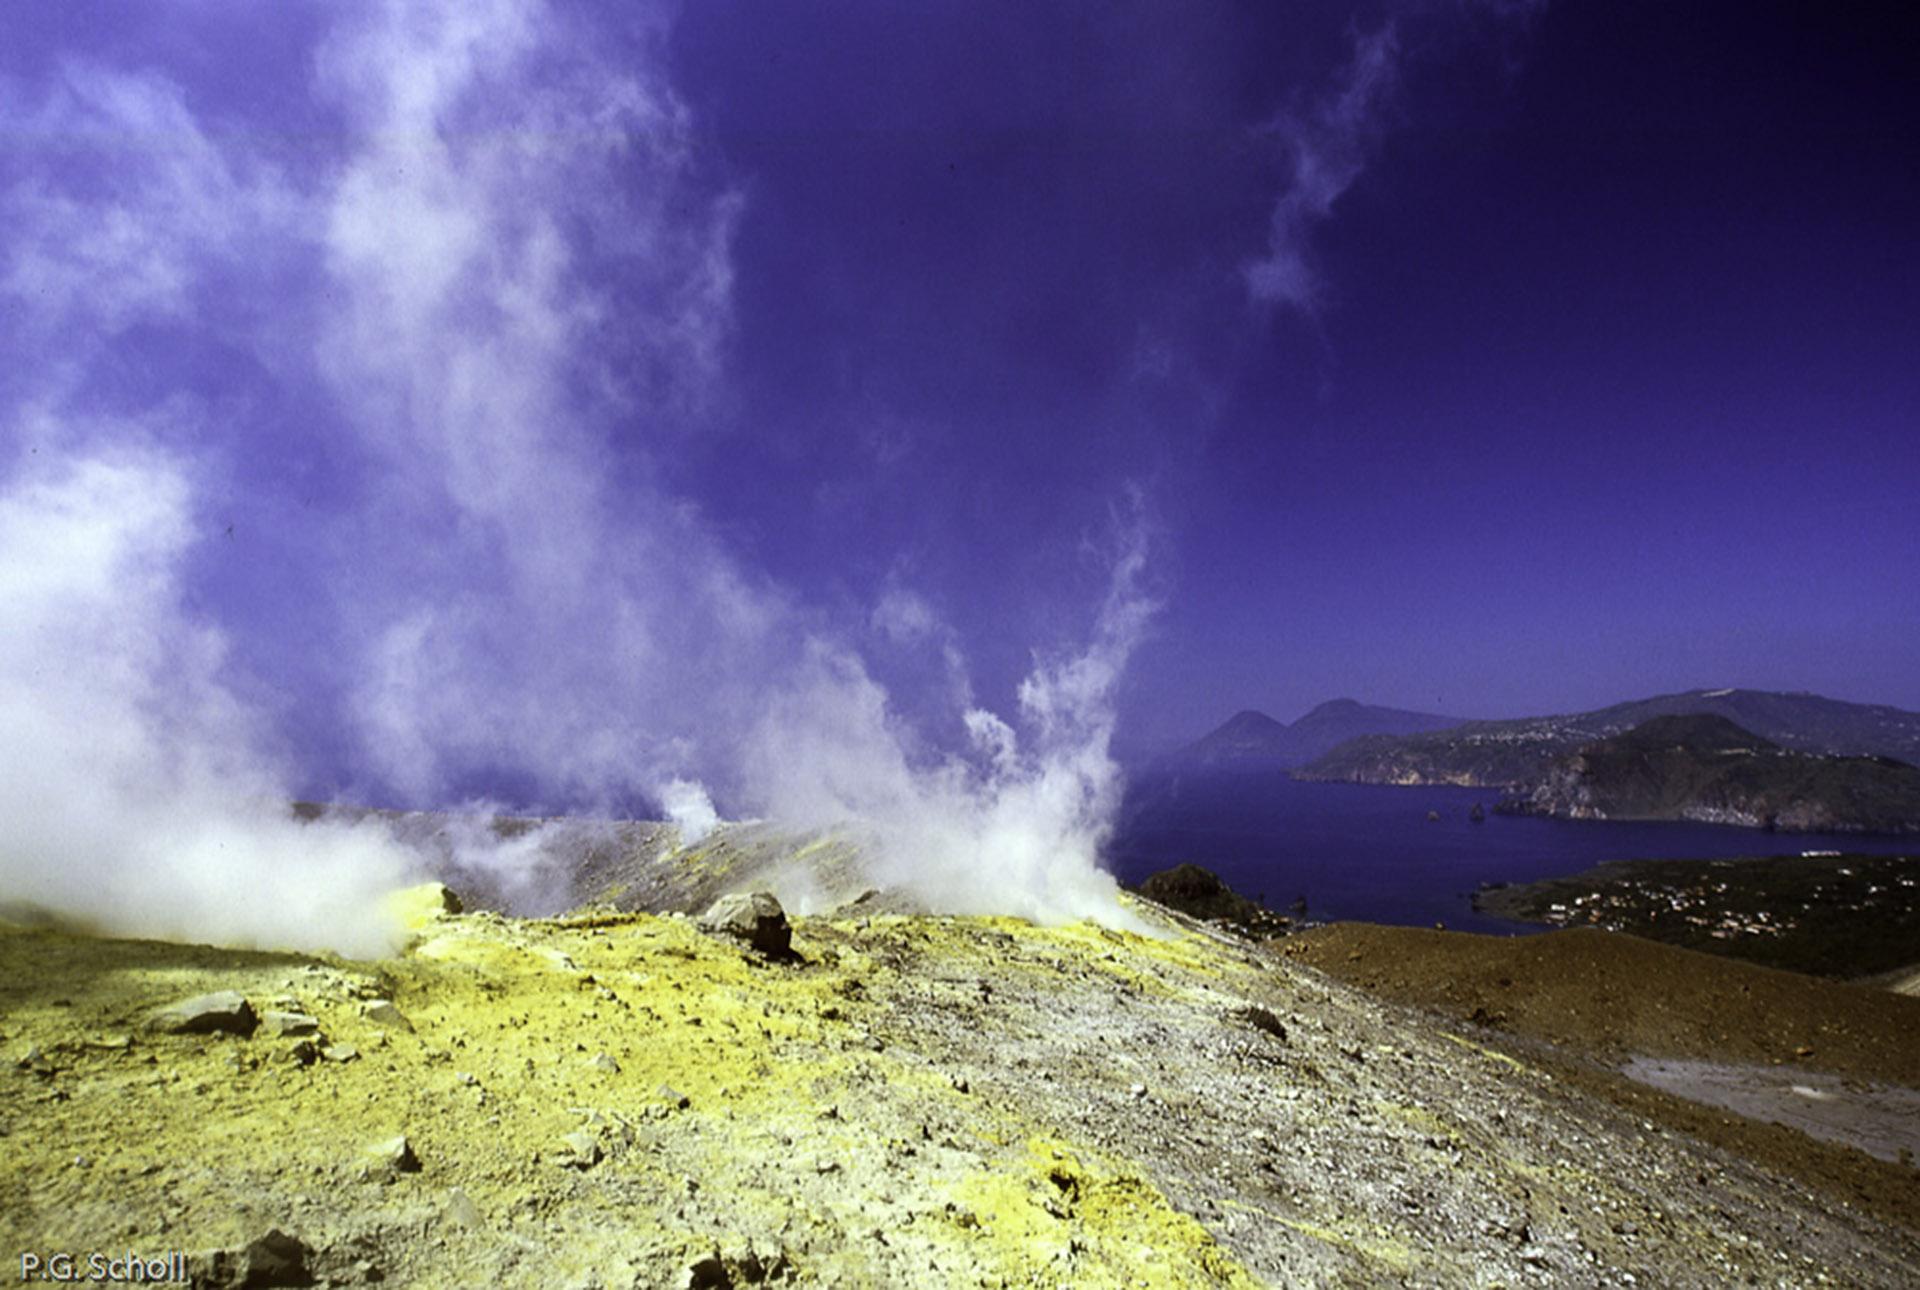 Vulcano, cratère et fumerolles